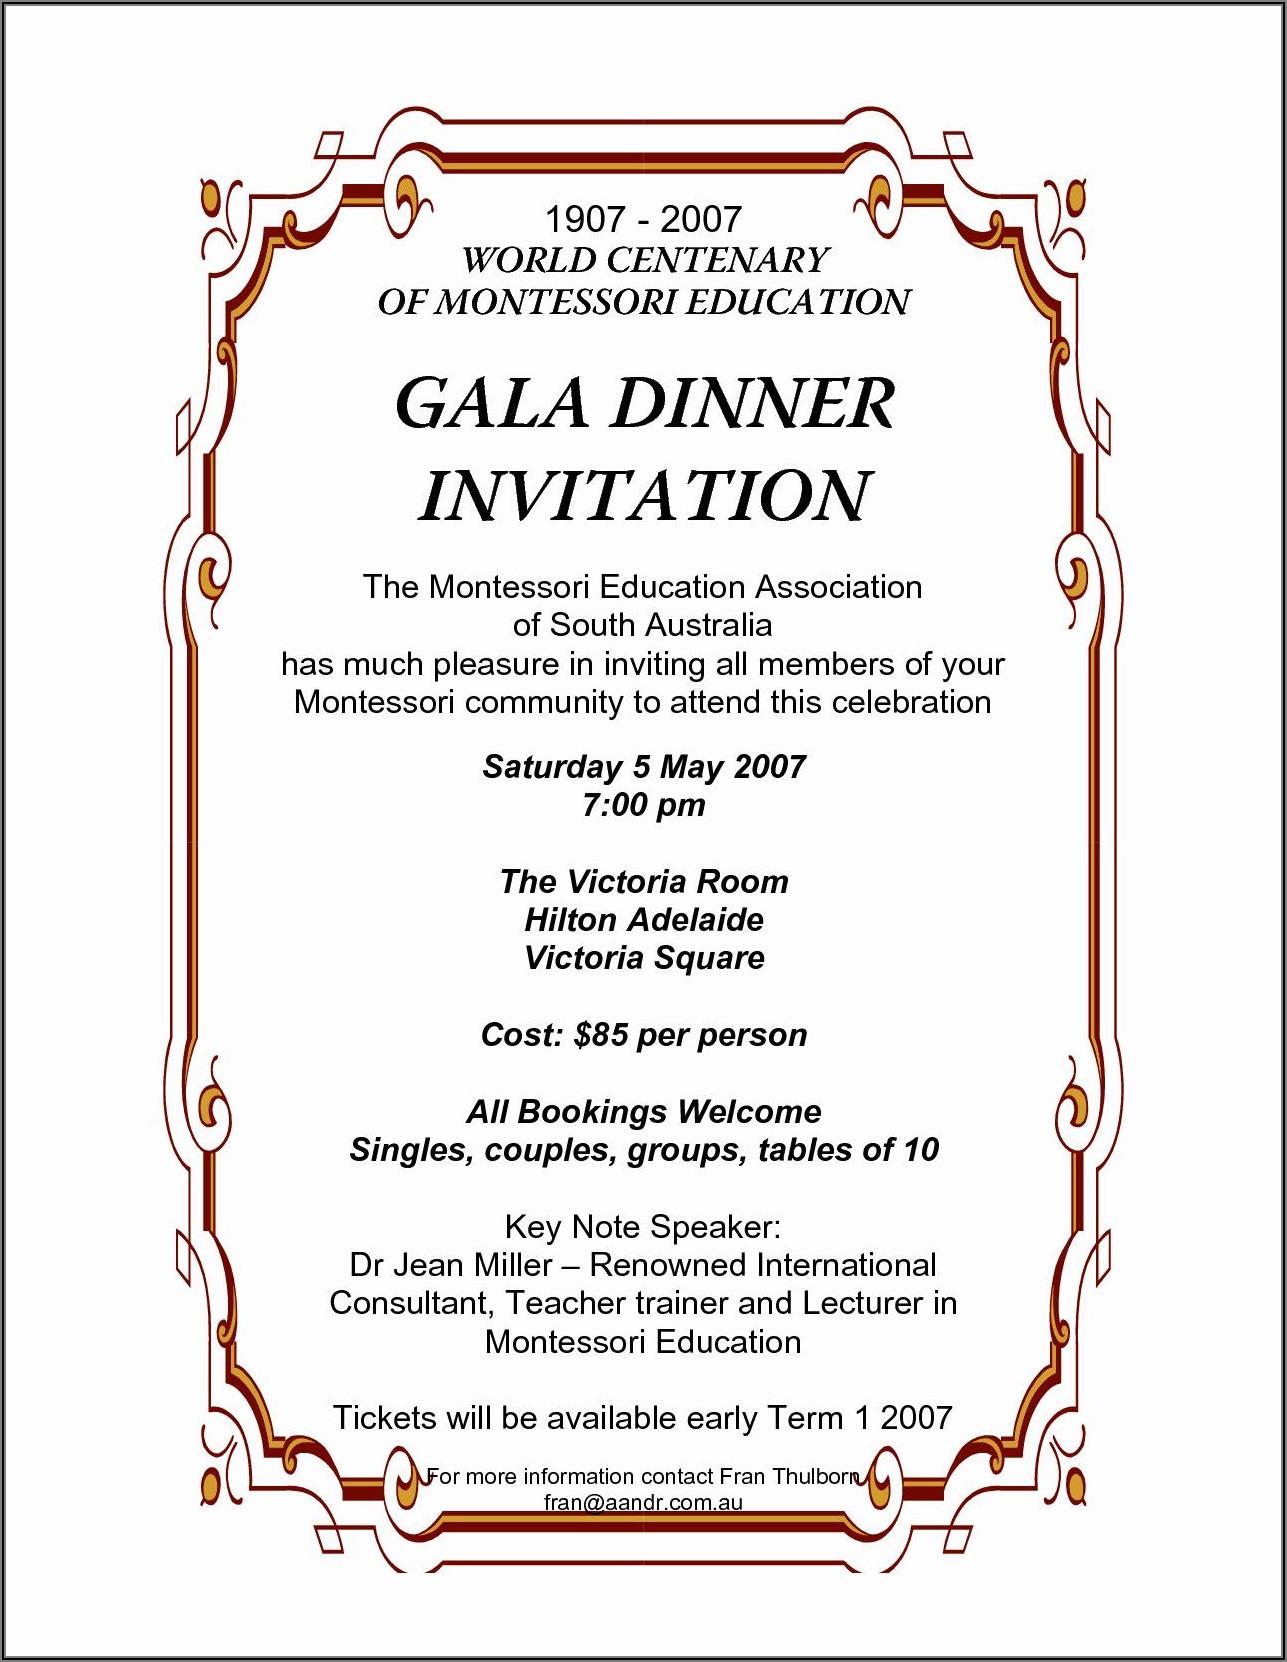 Gala Dinner Invitation Wording